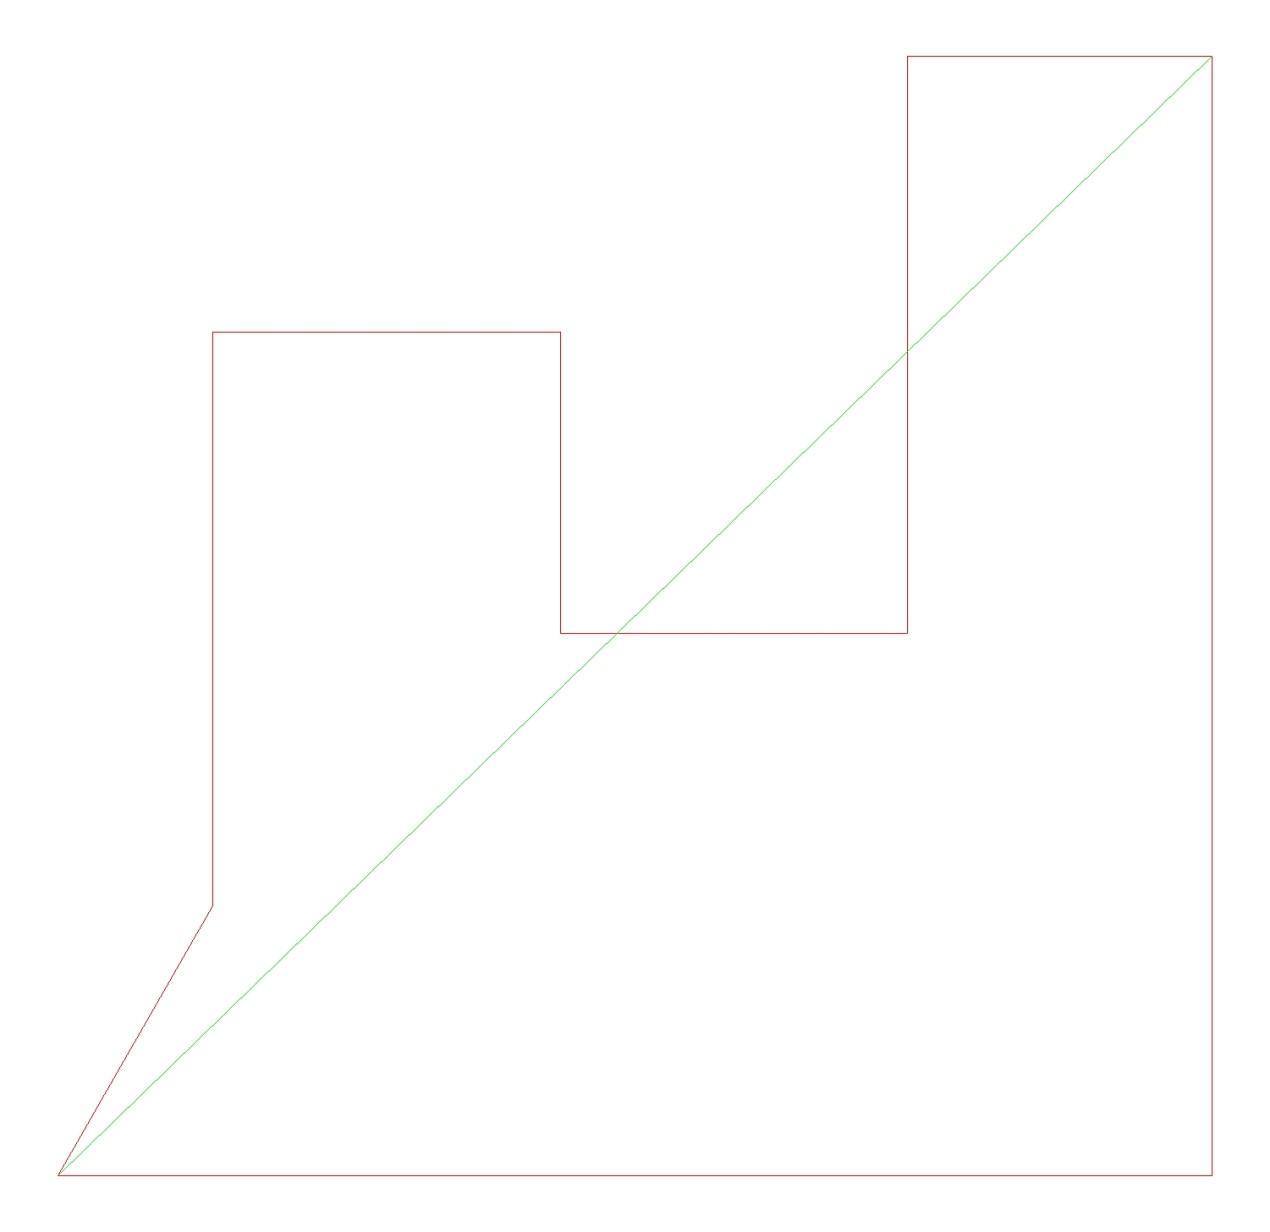 https://gn-api-res.s3.amazonaws.com/5df1f80c625b9a6e682be76af616d2cad01e7f655f7888c51ad993ebdf87e81e/dxf2gcode.jpg